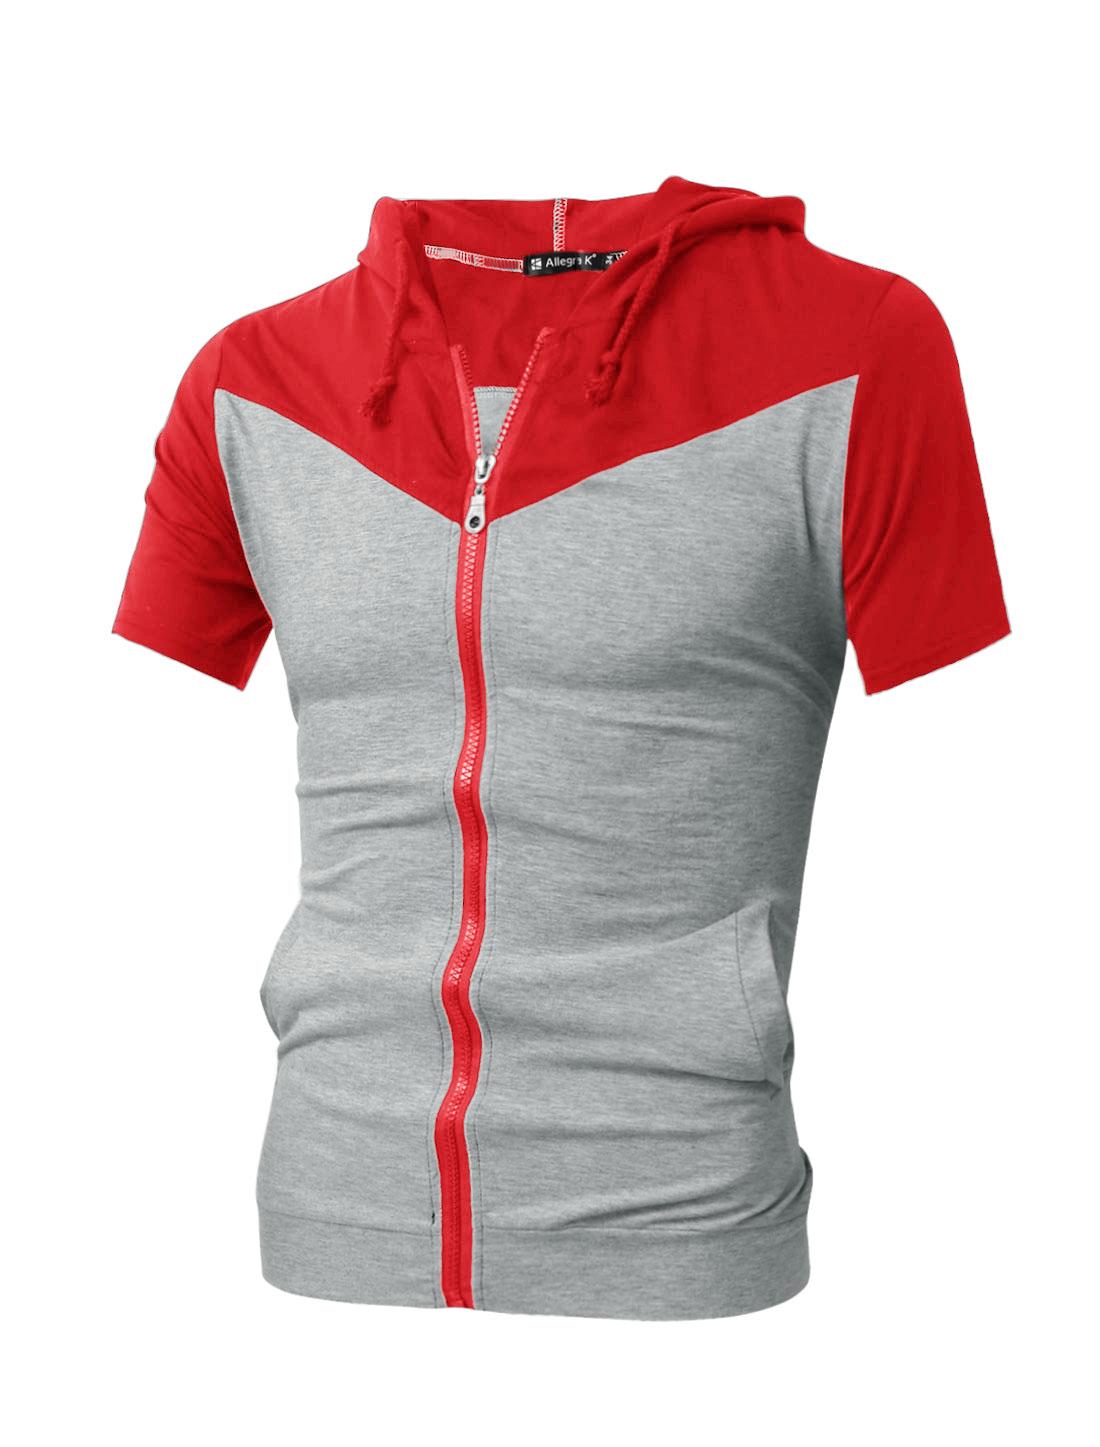 Men Red Gray Hooded Color Block Slant Pocket Sweatshirt M